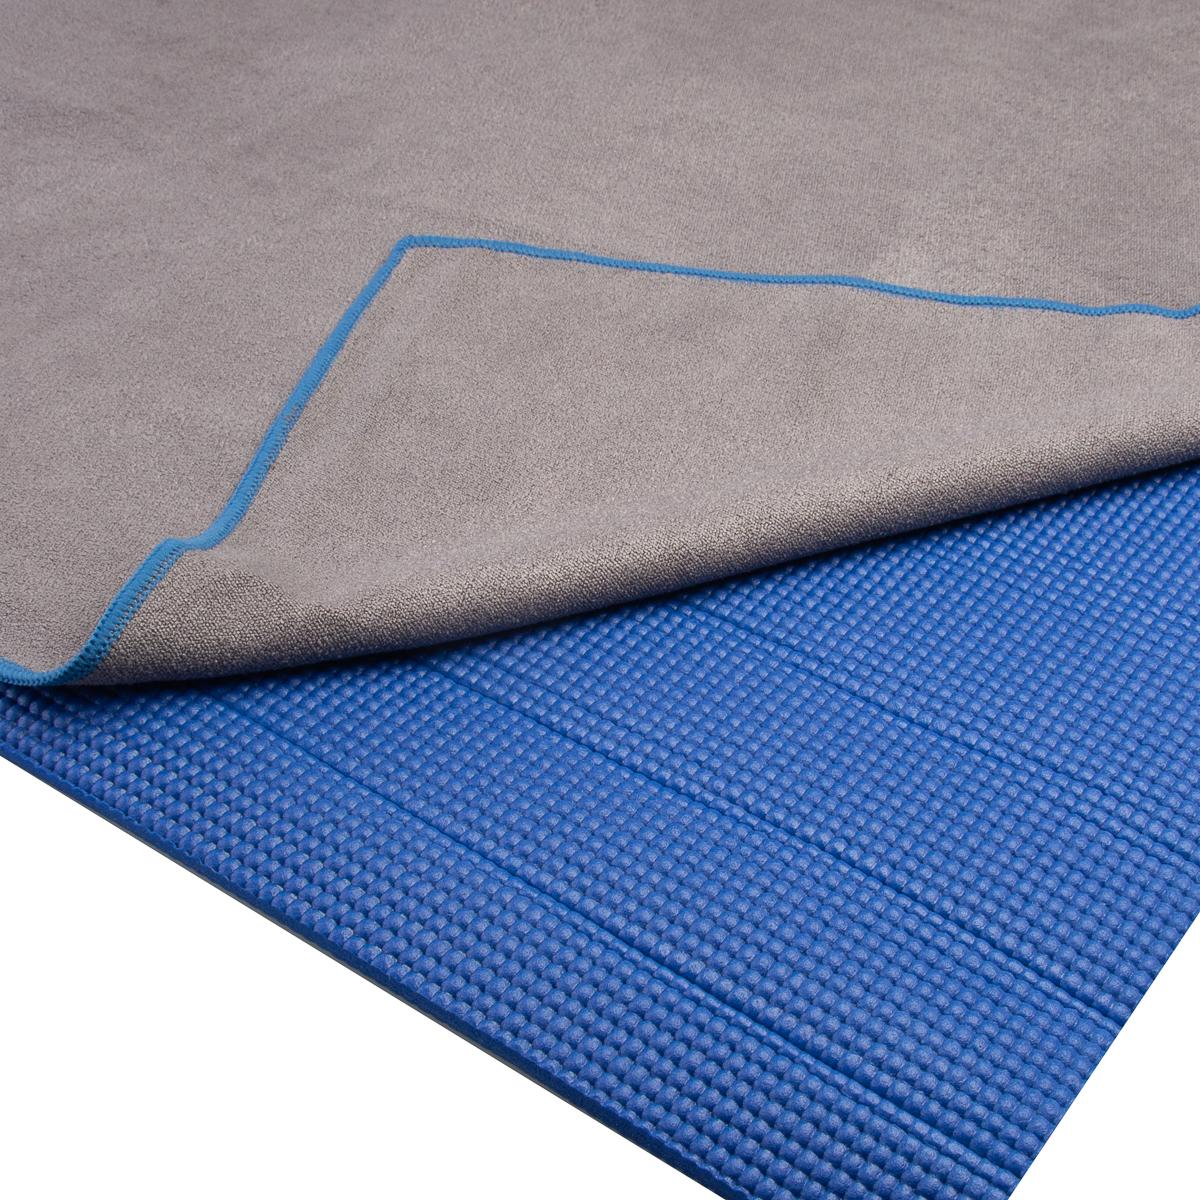 "2pk DG Sports 72x24"" Microfiber Hot Yoga Towel Non Slip Grip For ..."